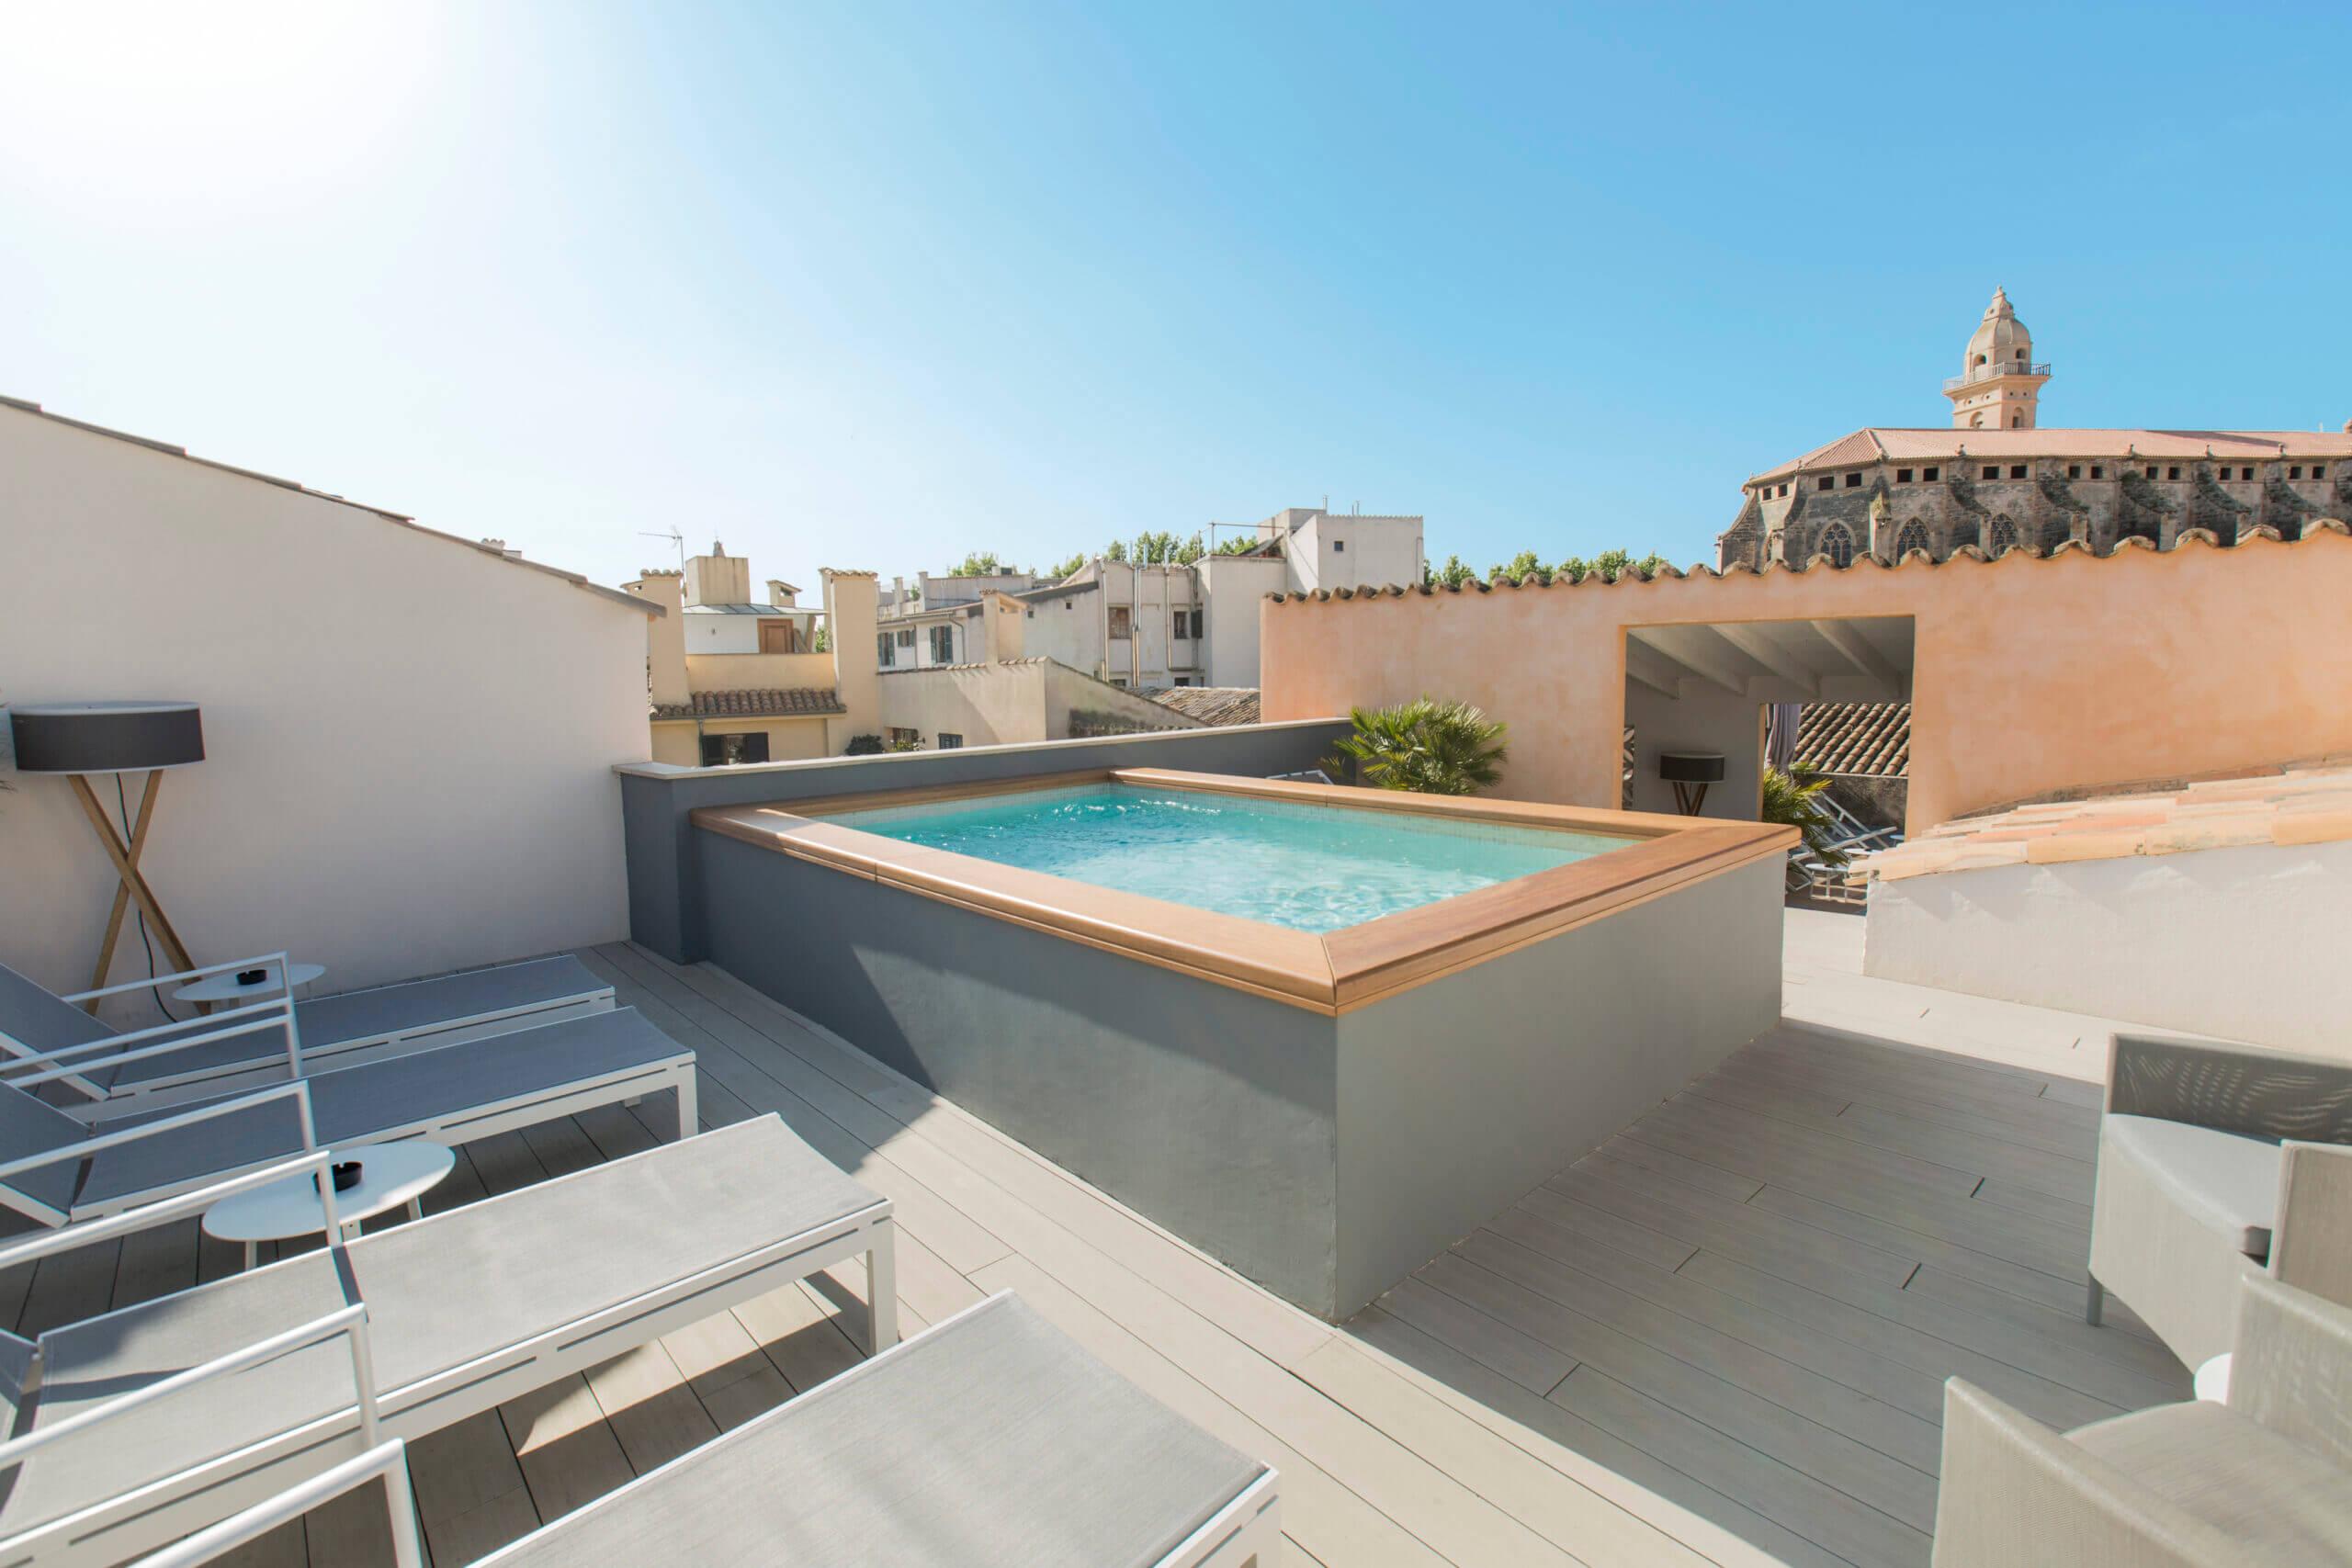 Experiencias healthy en Mallorca